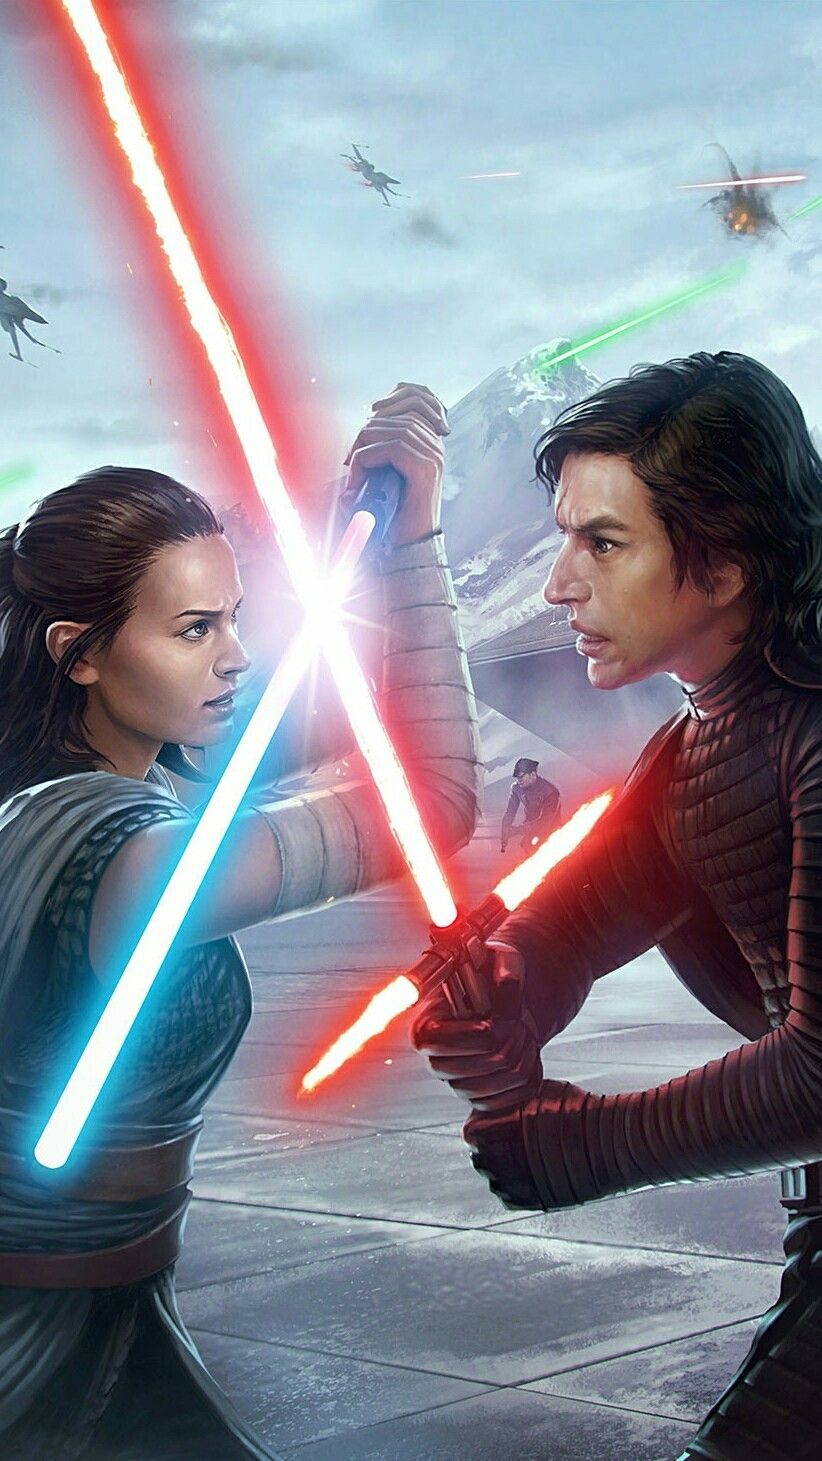 Epingle Par Jedi Demigod Subject A5 The Gl Sur Star Wars Affiche Star Wars Chewbacca Leia